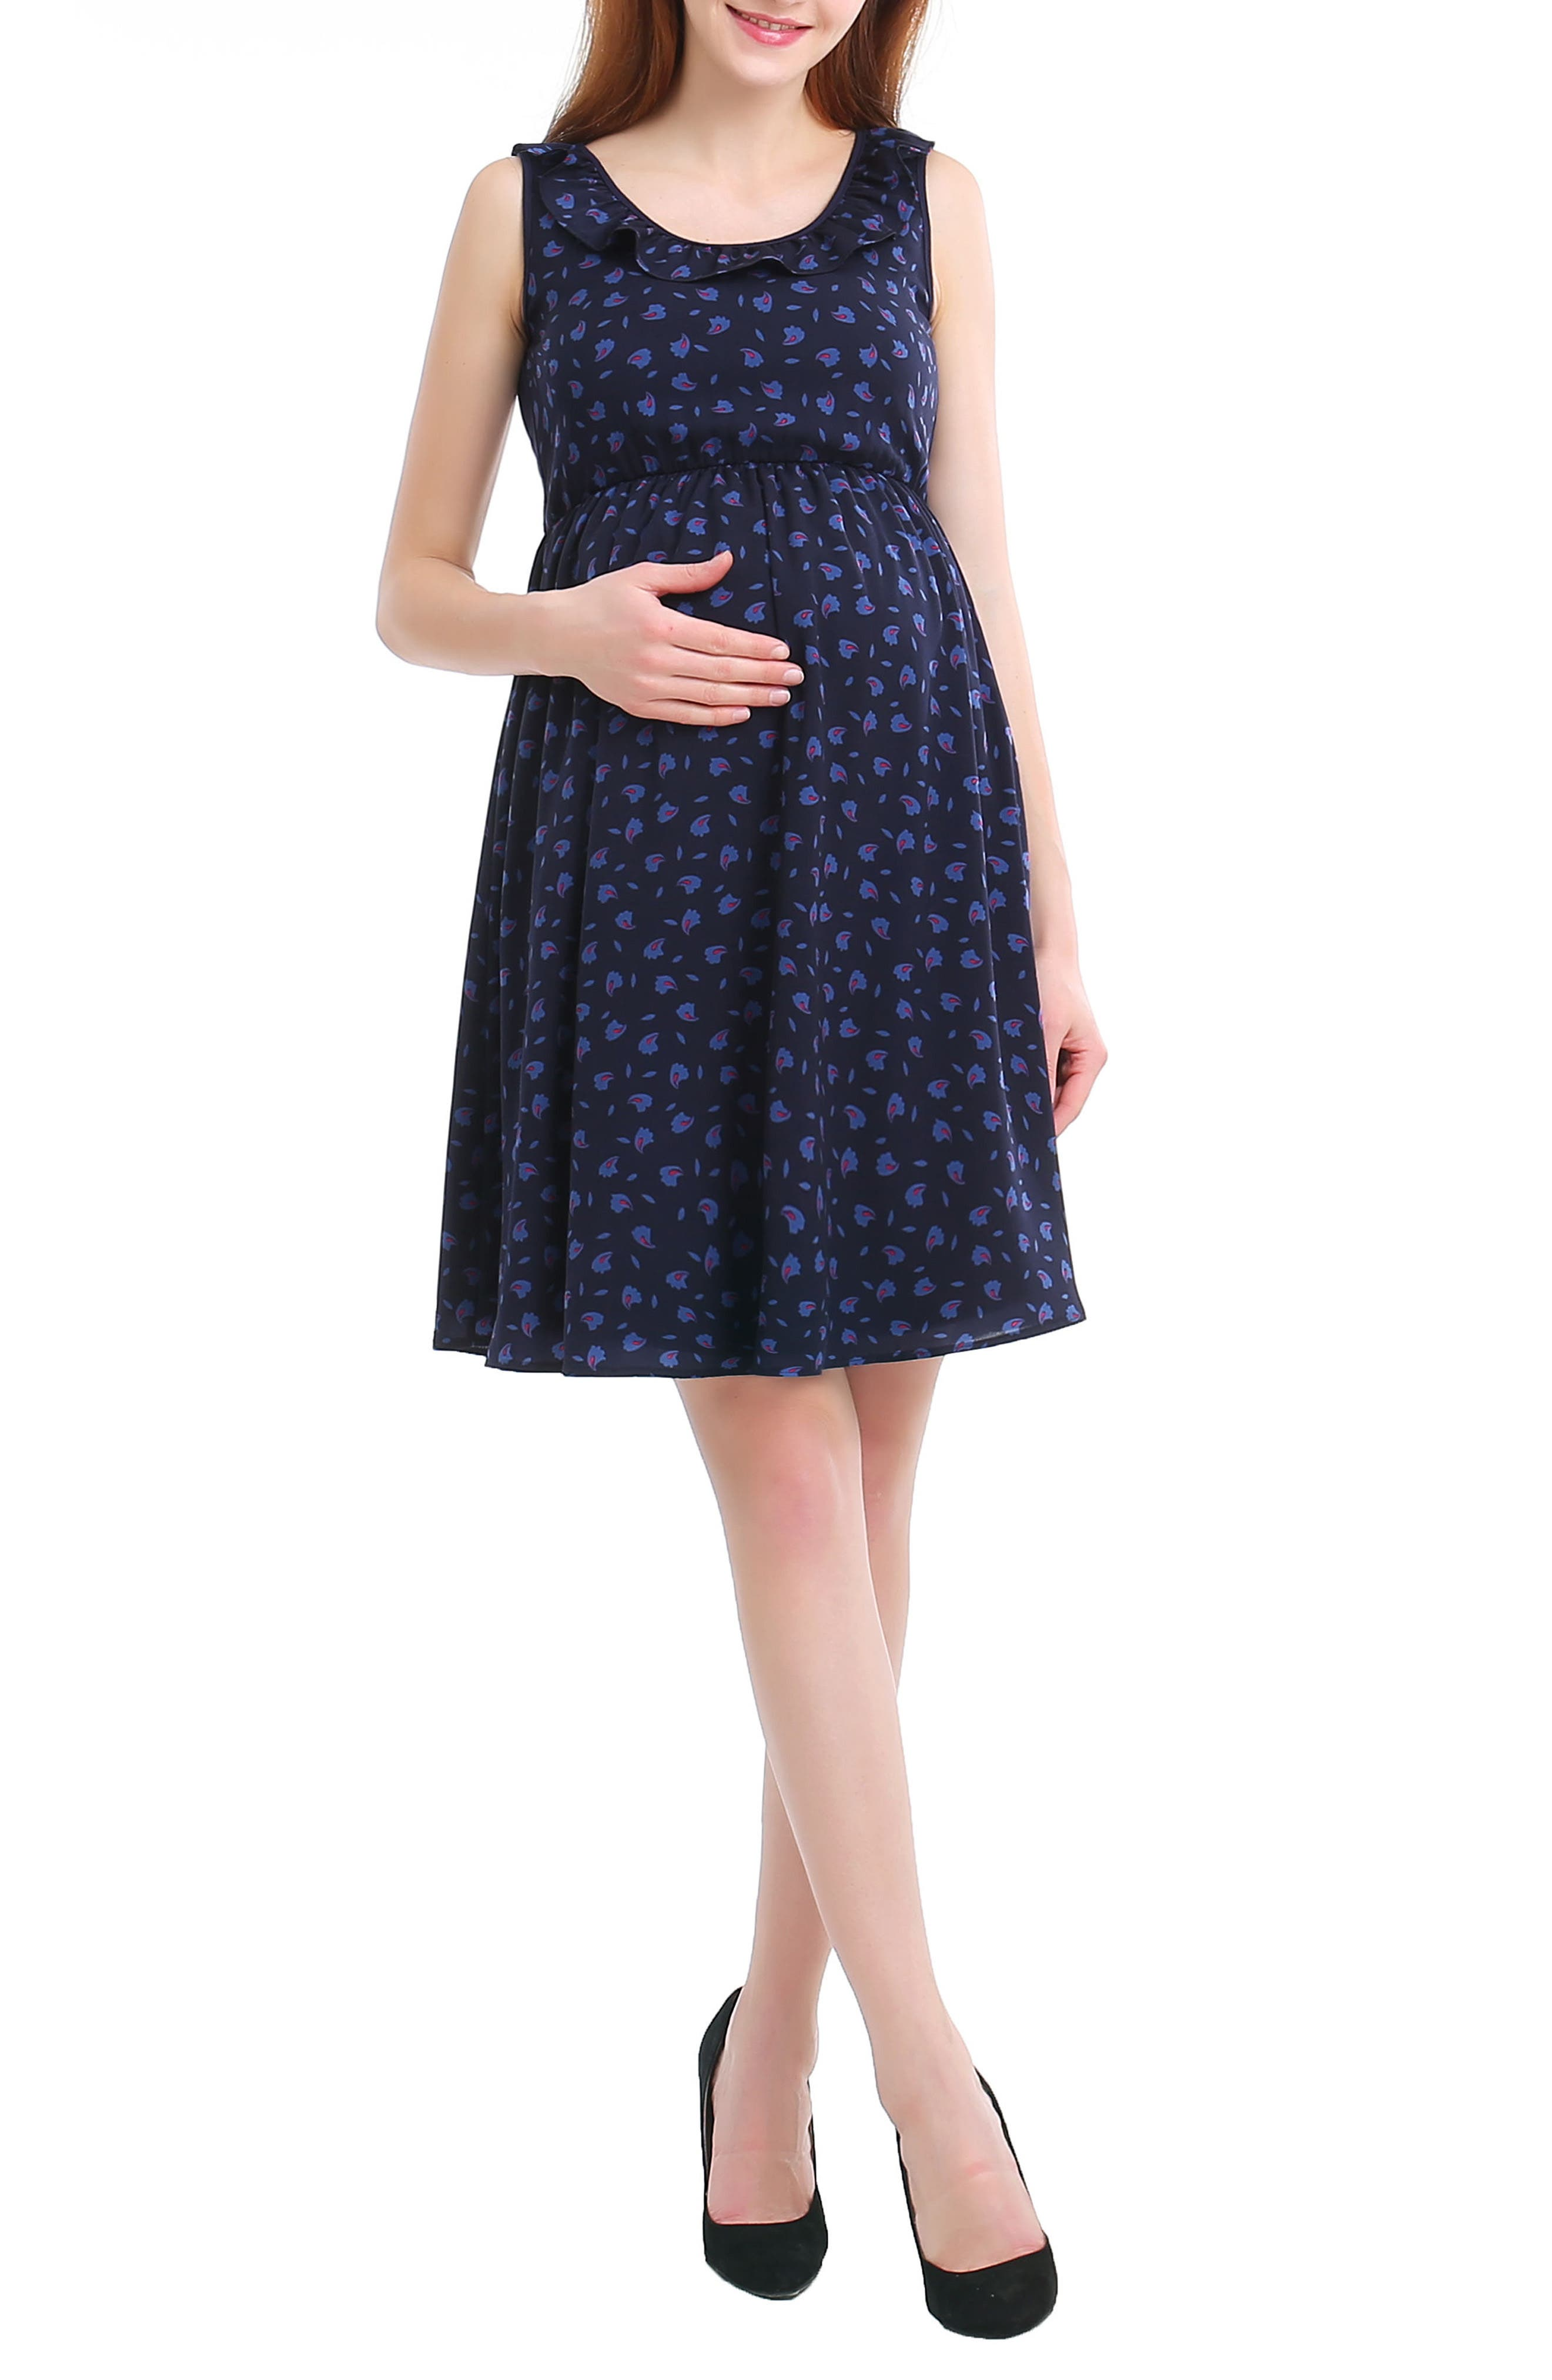 Brooke Print Skater Maternity Dress,                             Main thumbnail 1, color,                             NAVY